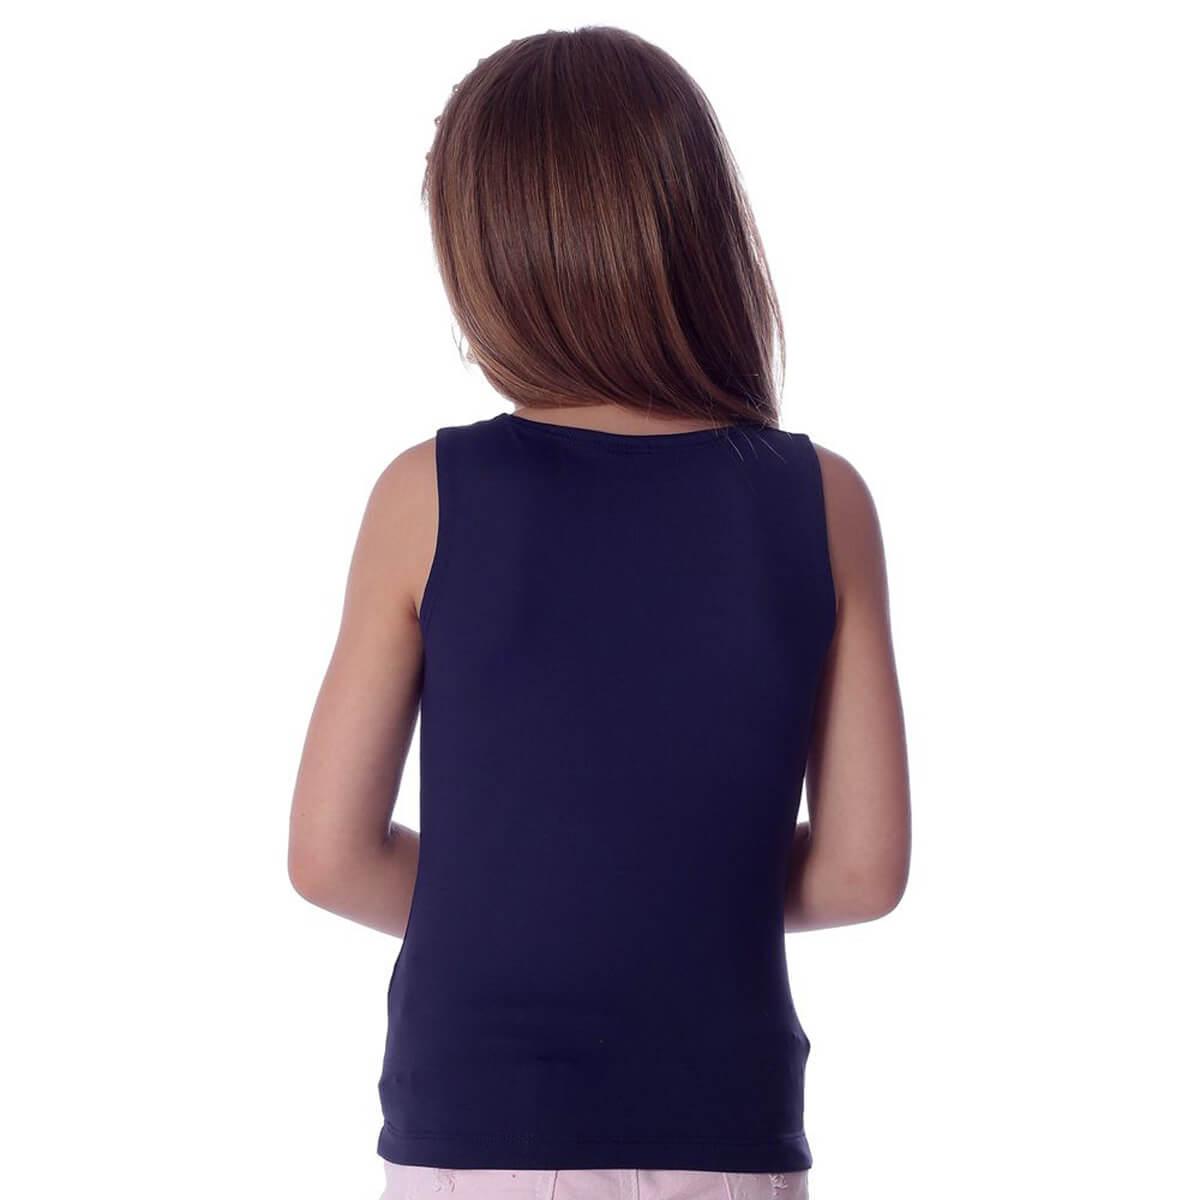 Regata Infantil Feminina Azul Marinho Decote Canoa